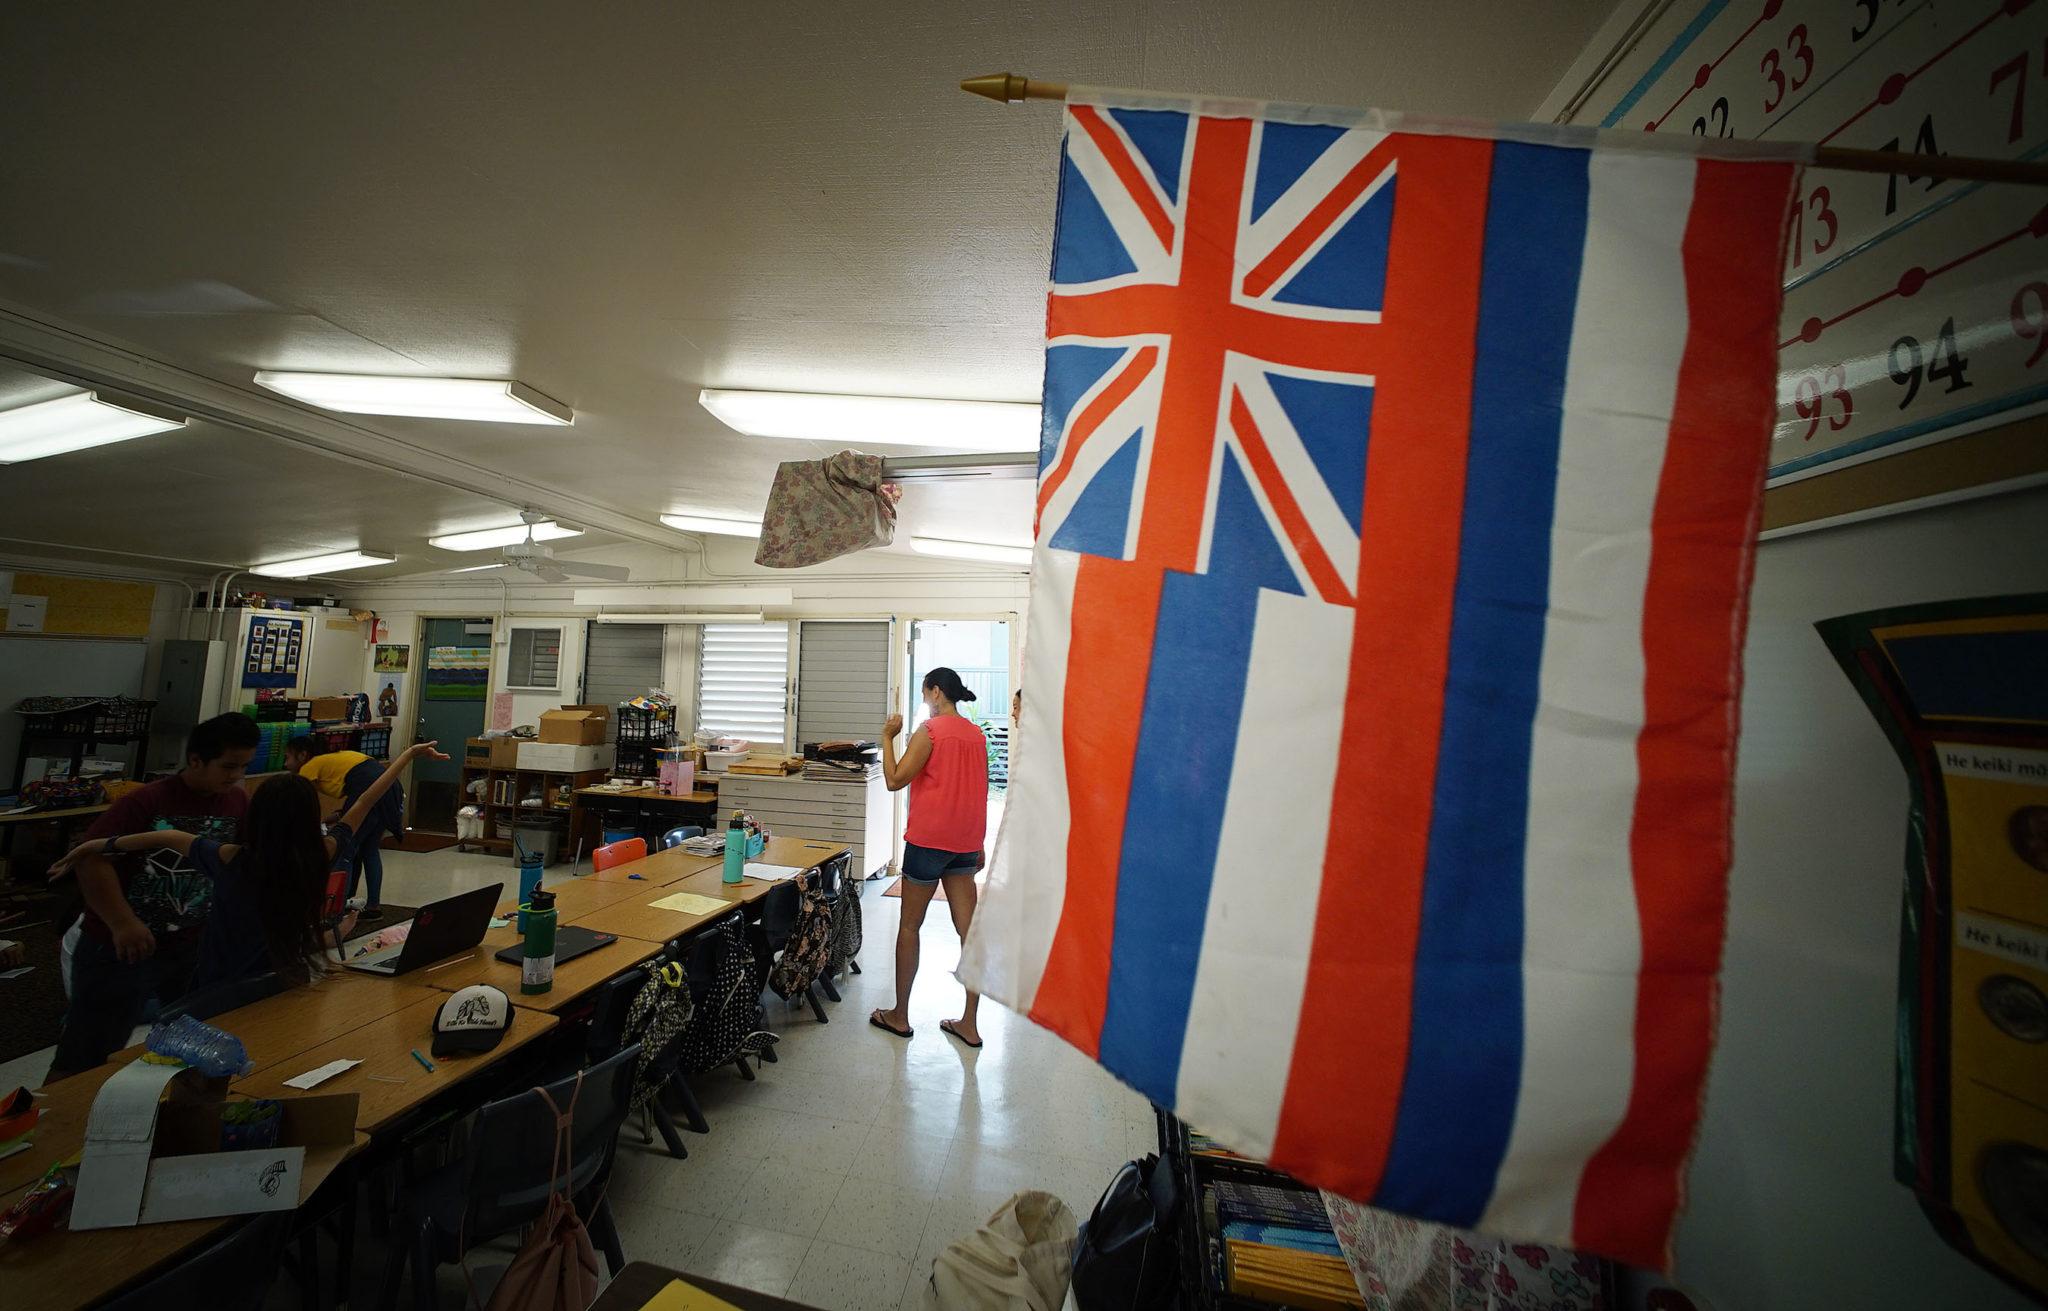 Teacher Monica Eliana is the 'Grow Your Own' teacher/candidate at Waiau Elementary.